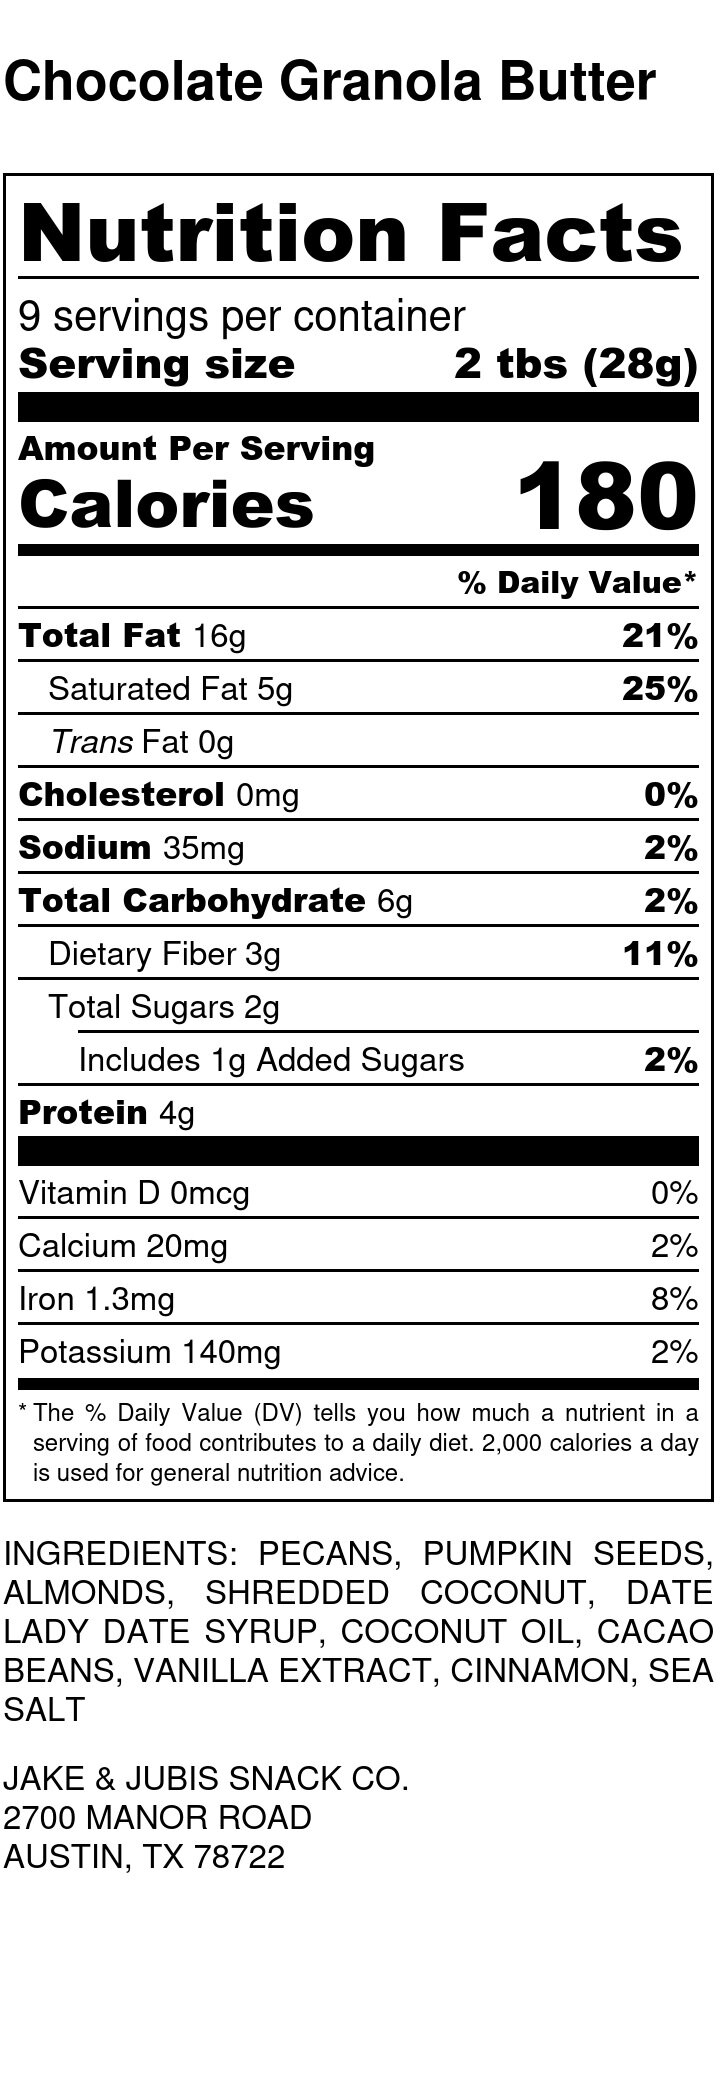 Chocolate Granola Butter - Nutrition Label.jpg